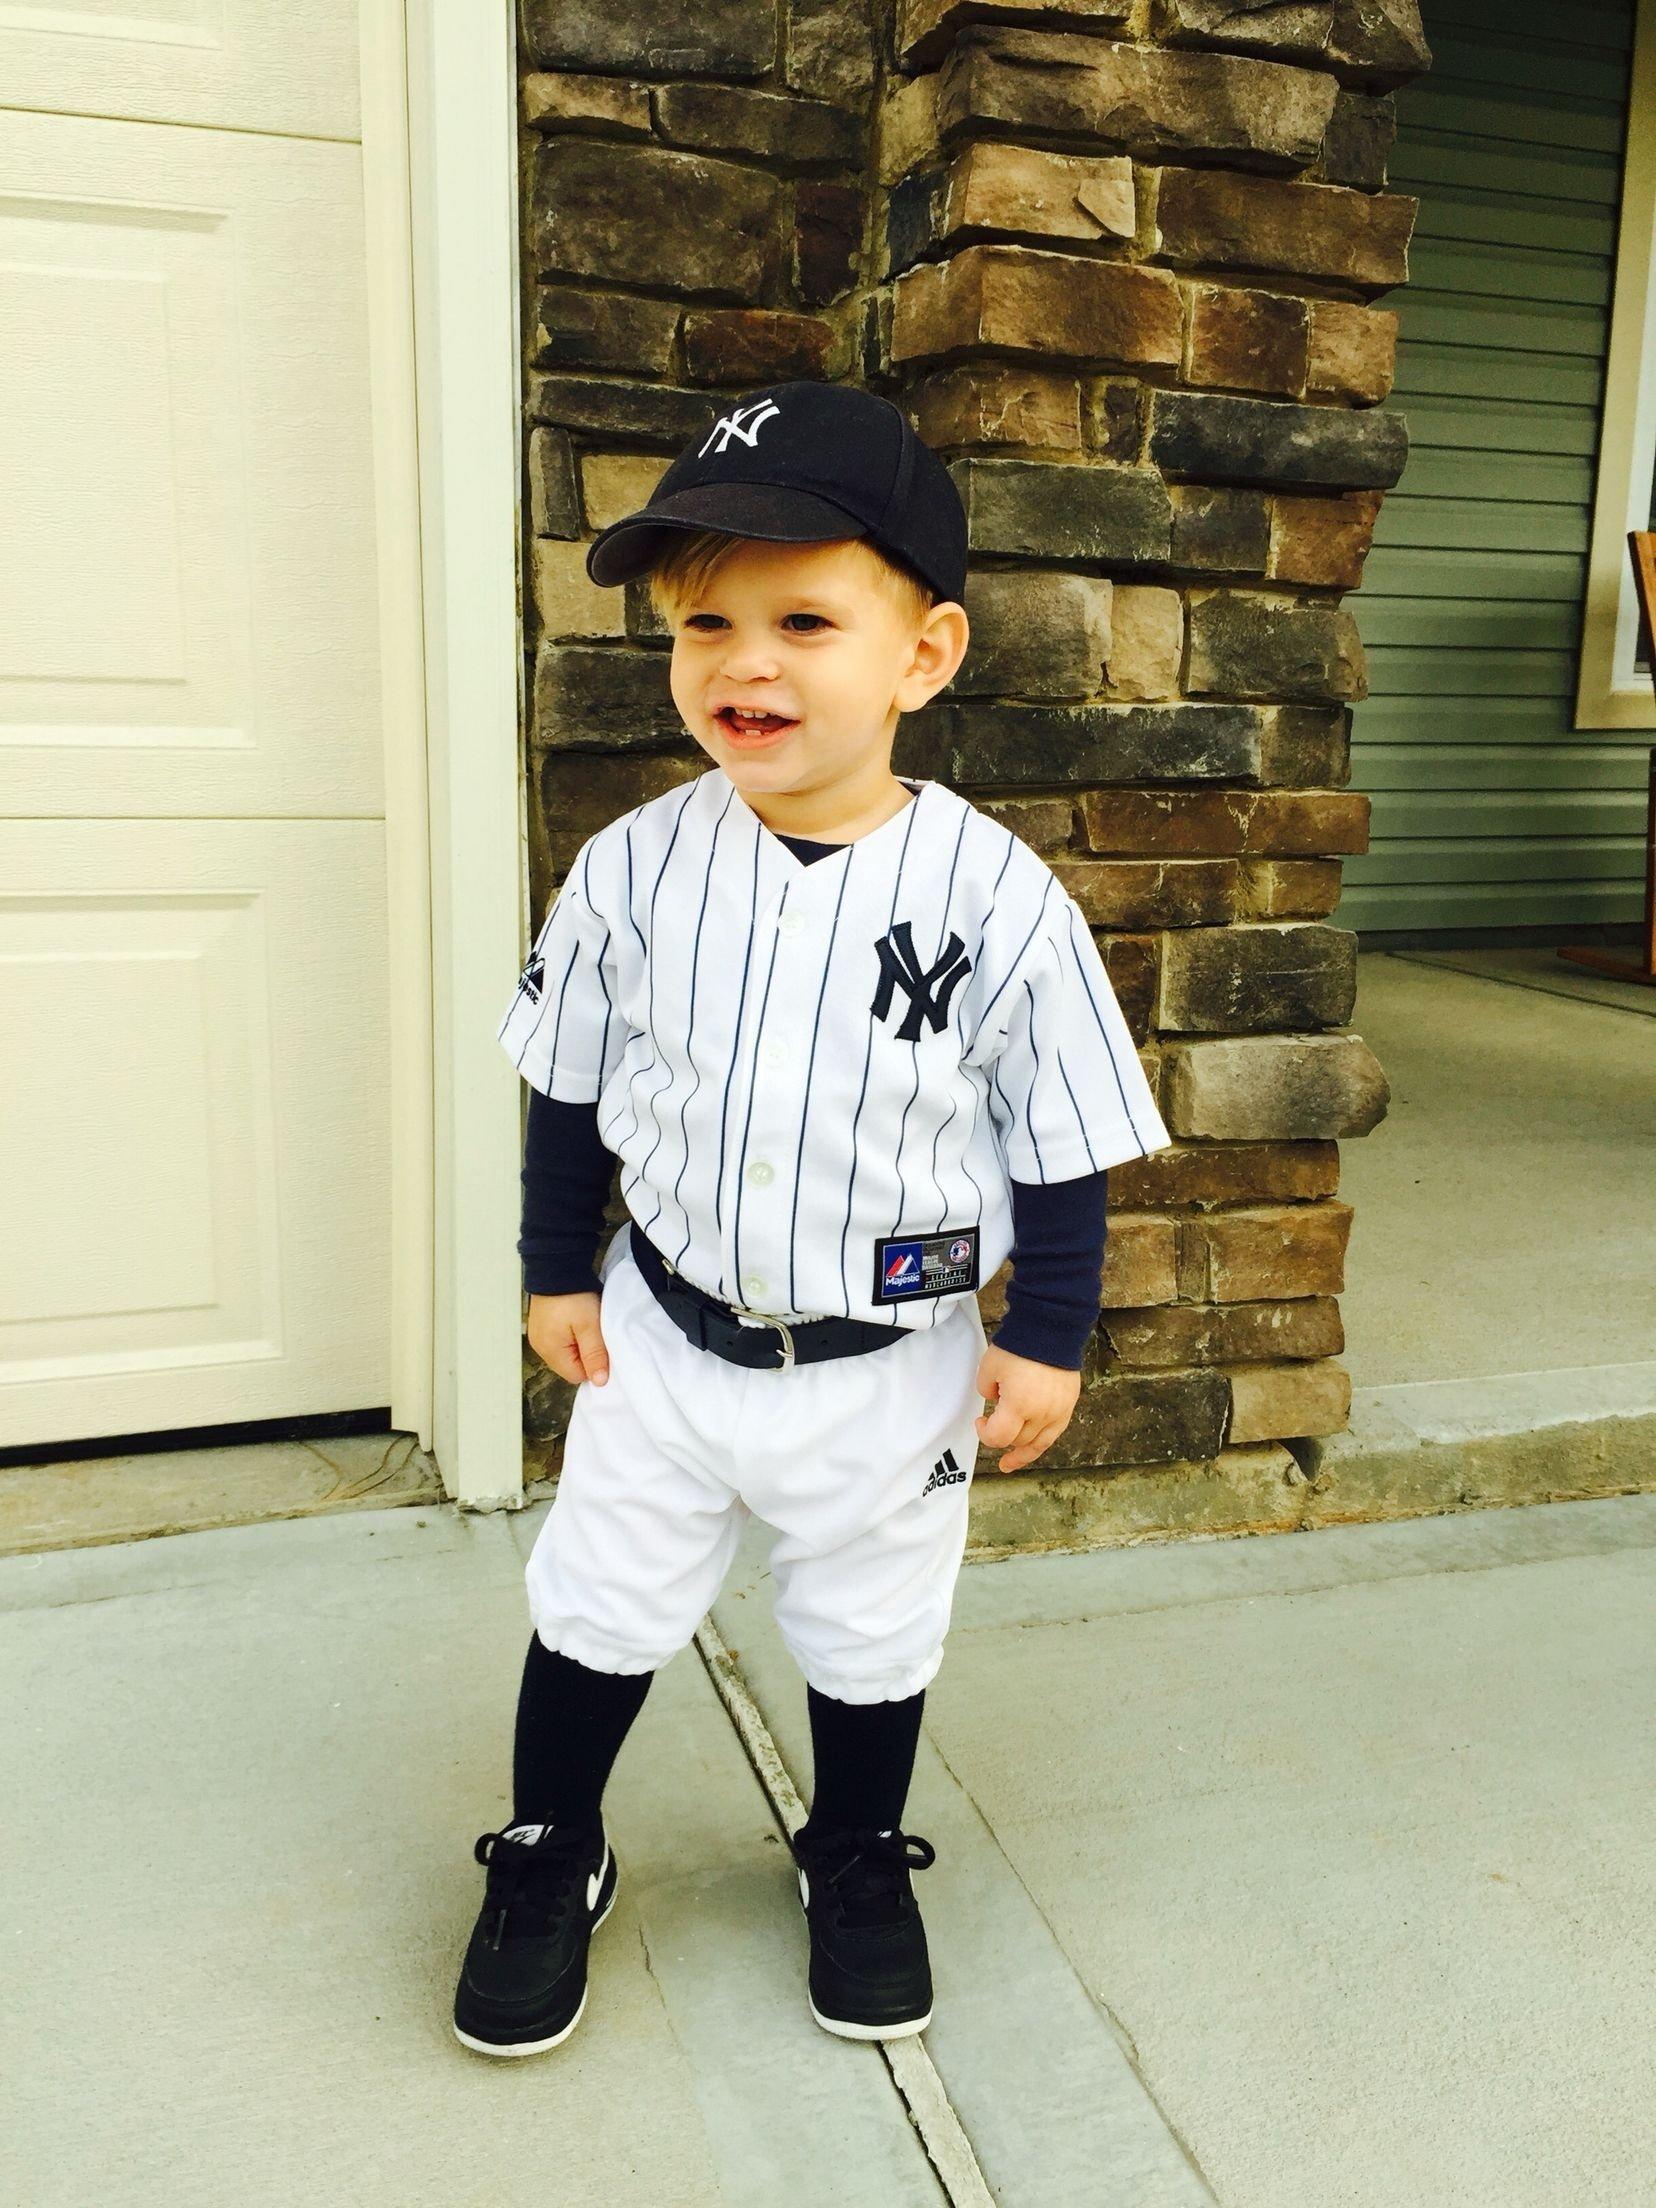 10 Fabulous Unique Toddler Halloween Costume Ideas cole david 2014 halloween costume toddler baseball player yankees 2021